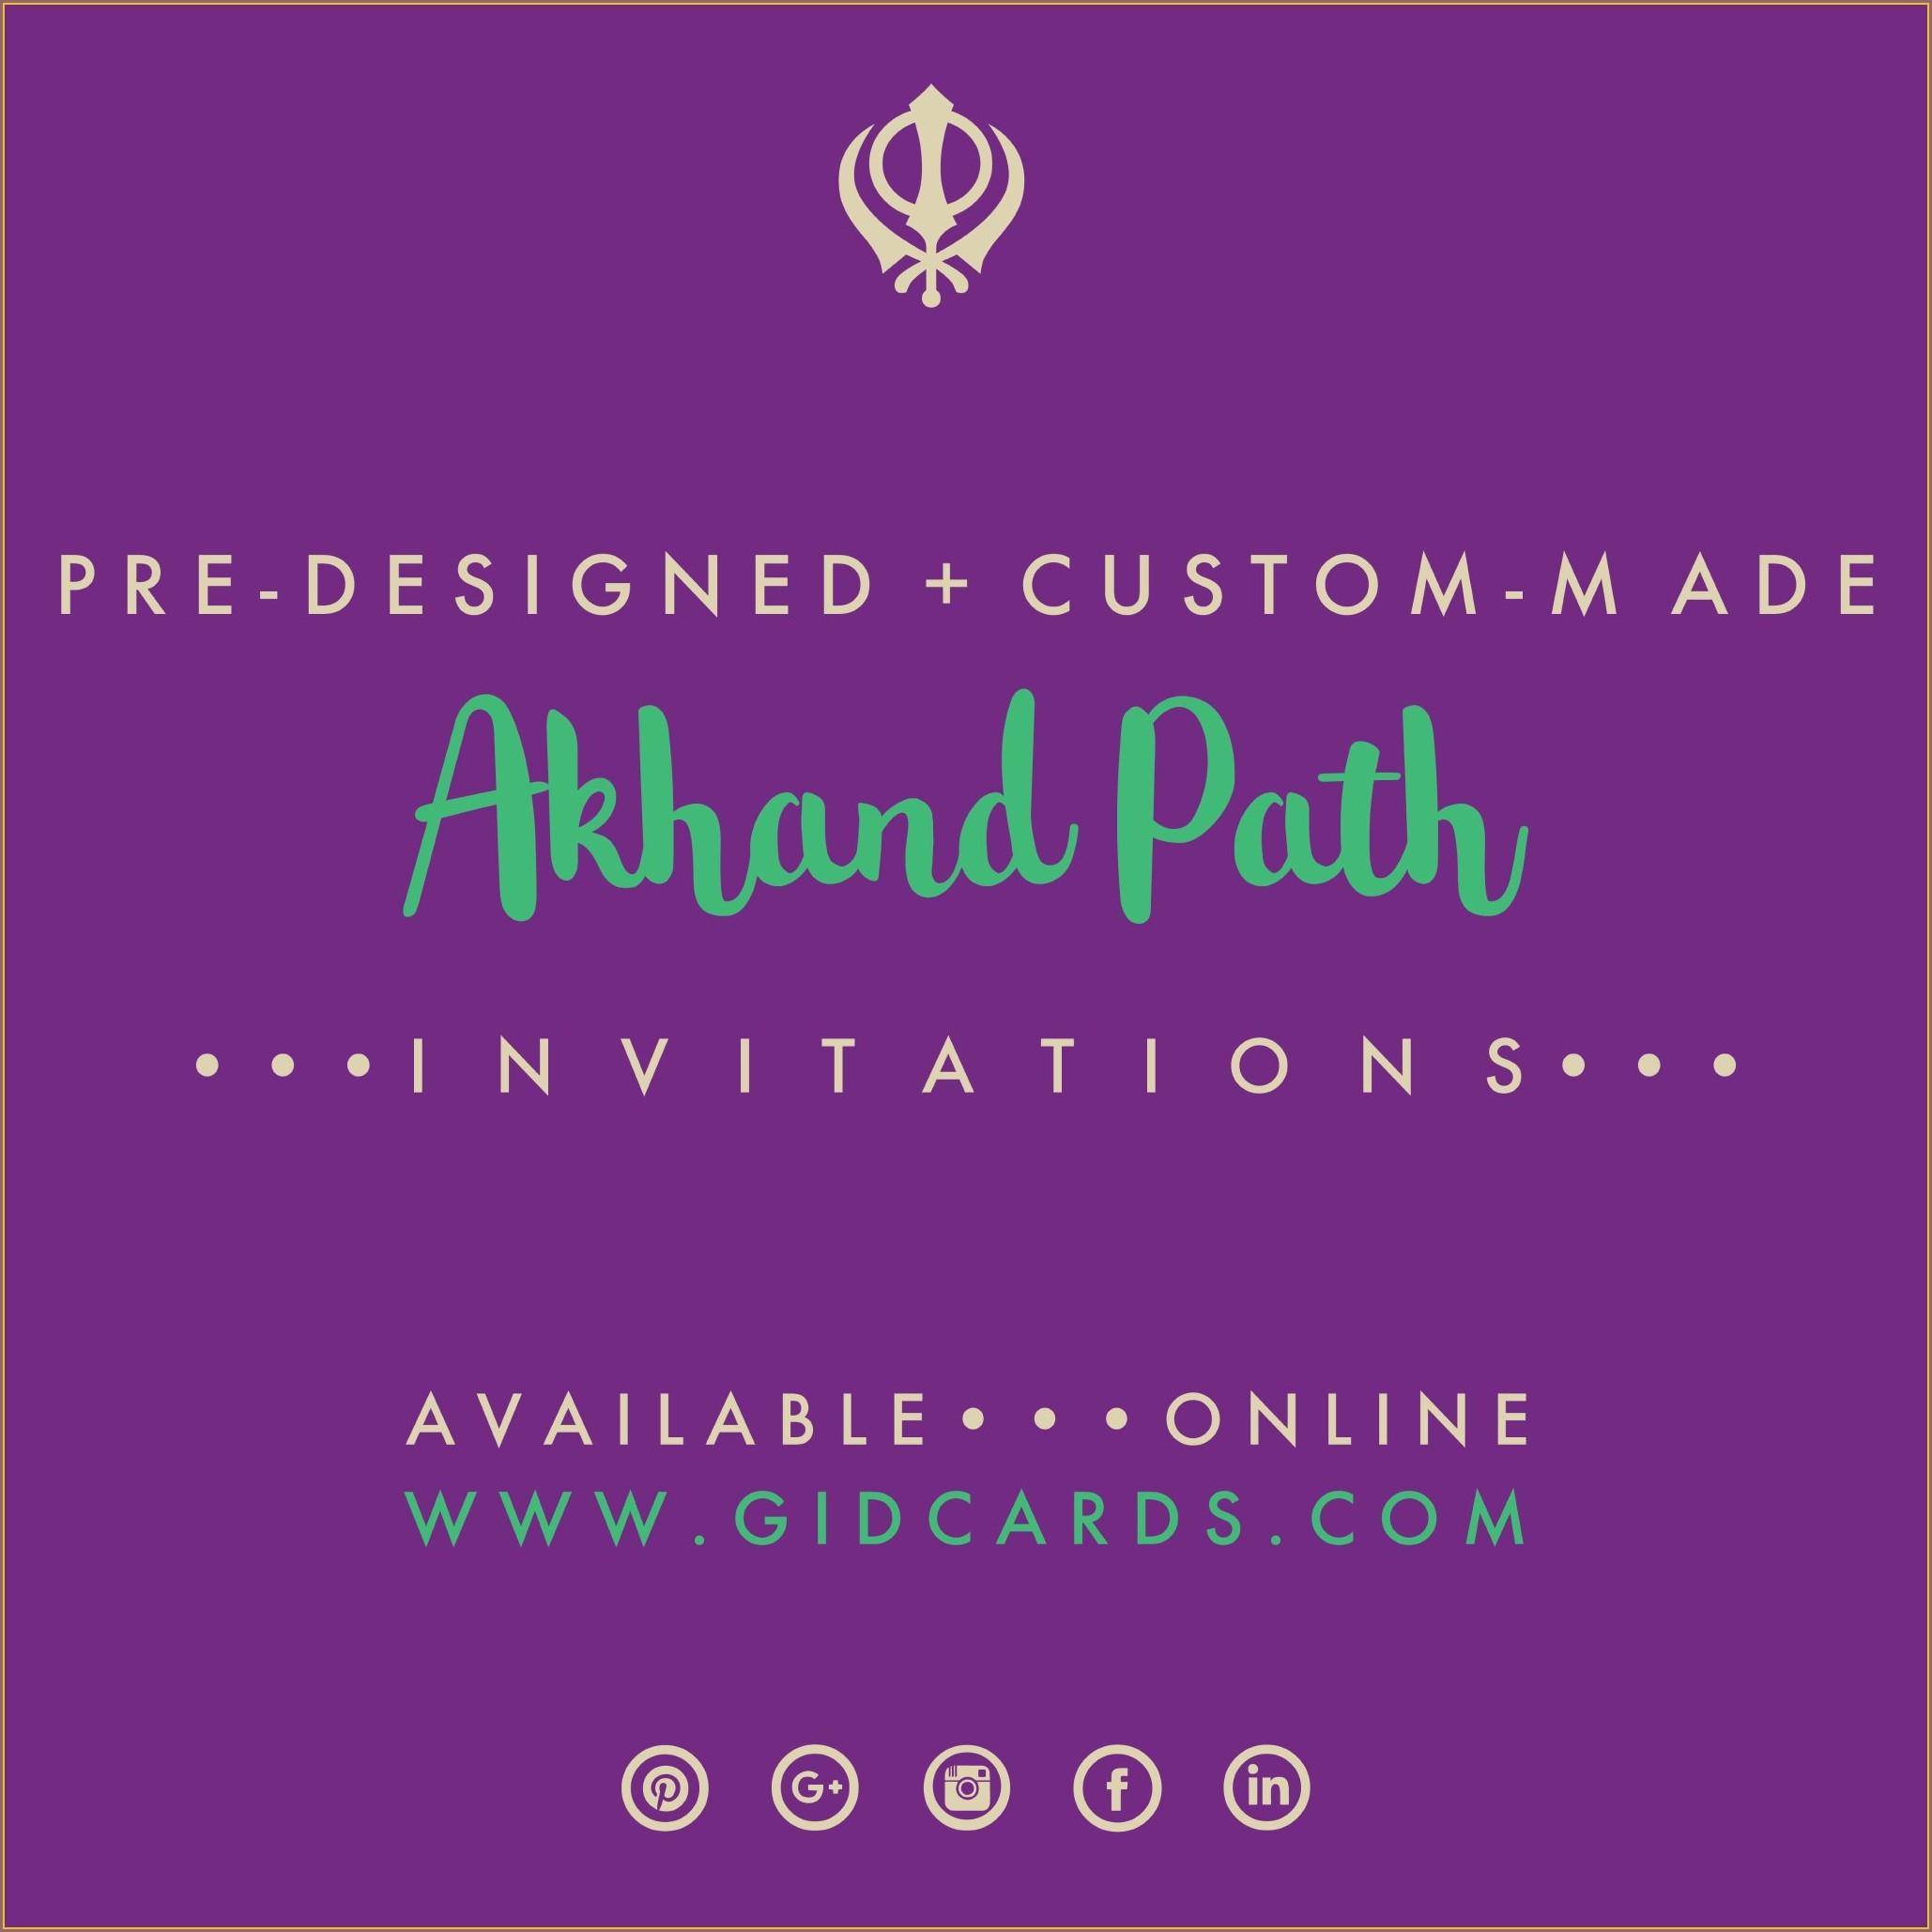 Akhand Path Invitation Sms